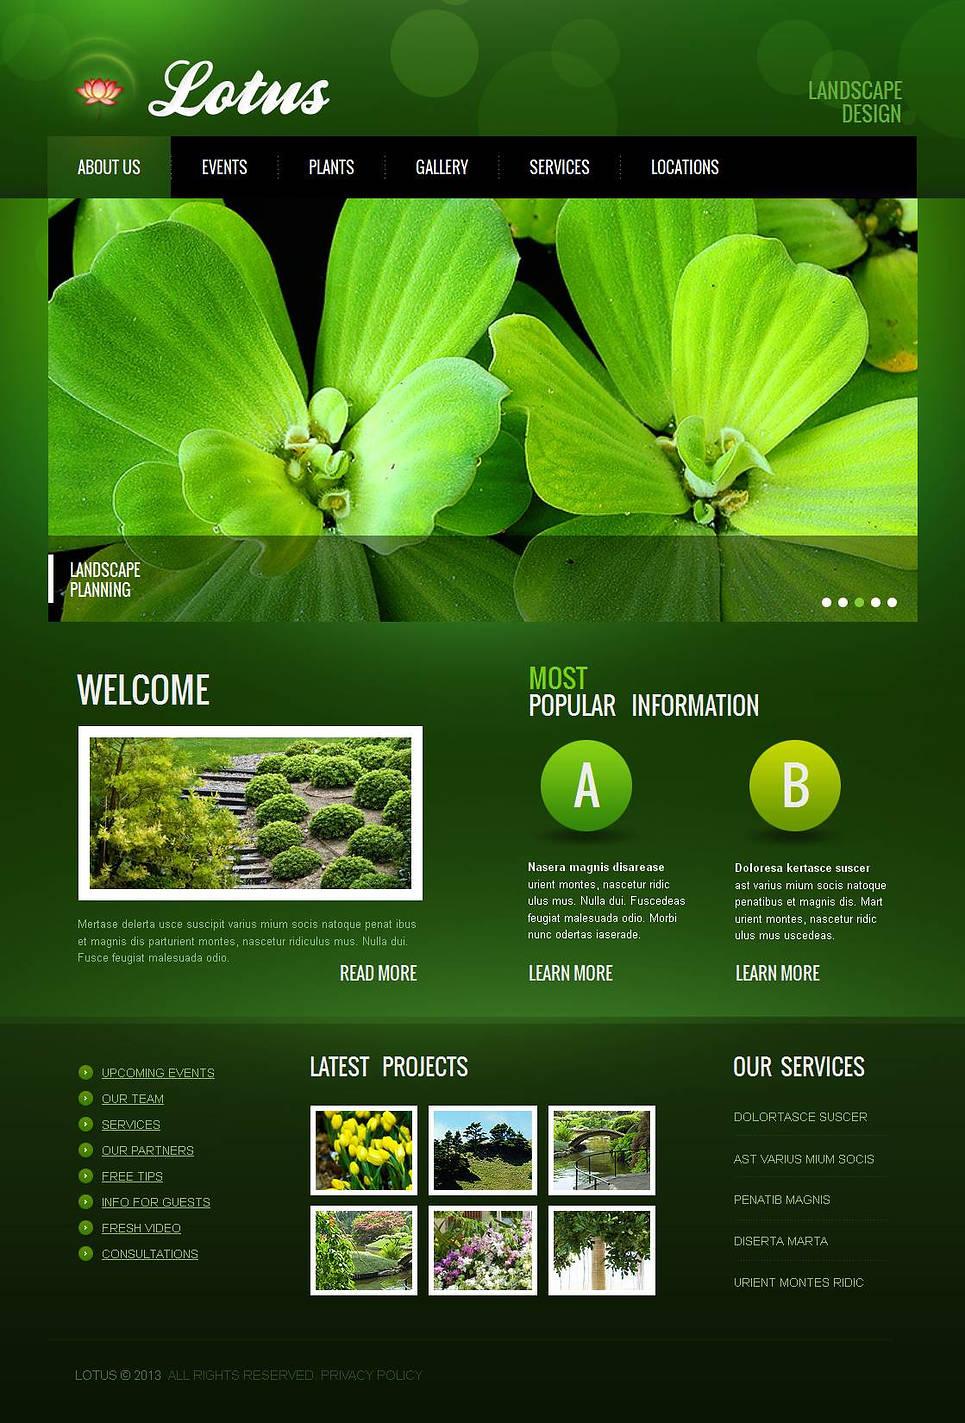 Eco Style Landscape Design Template - image